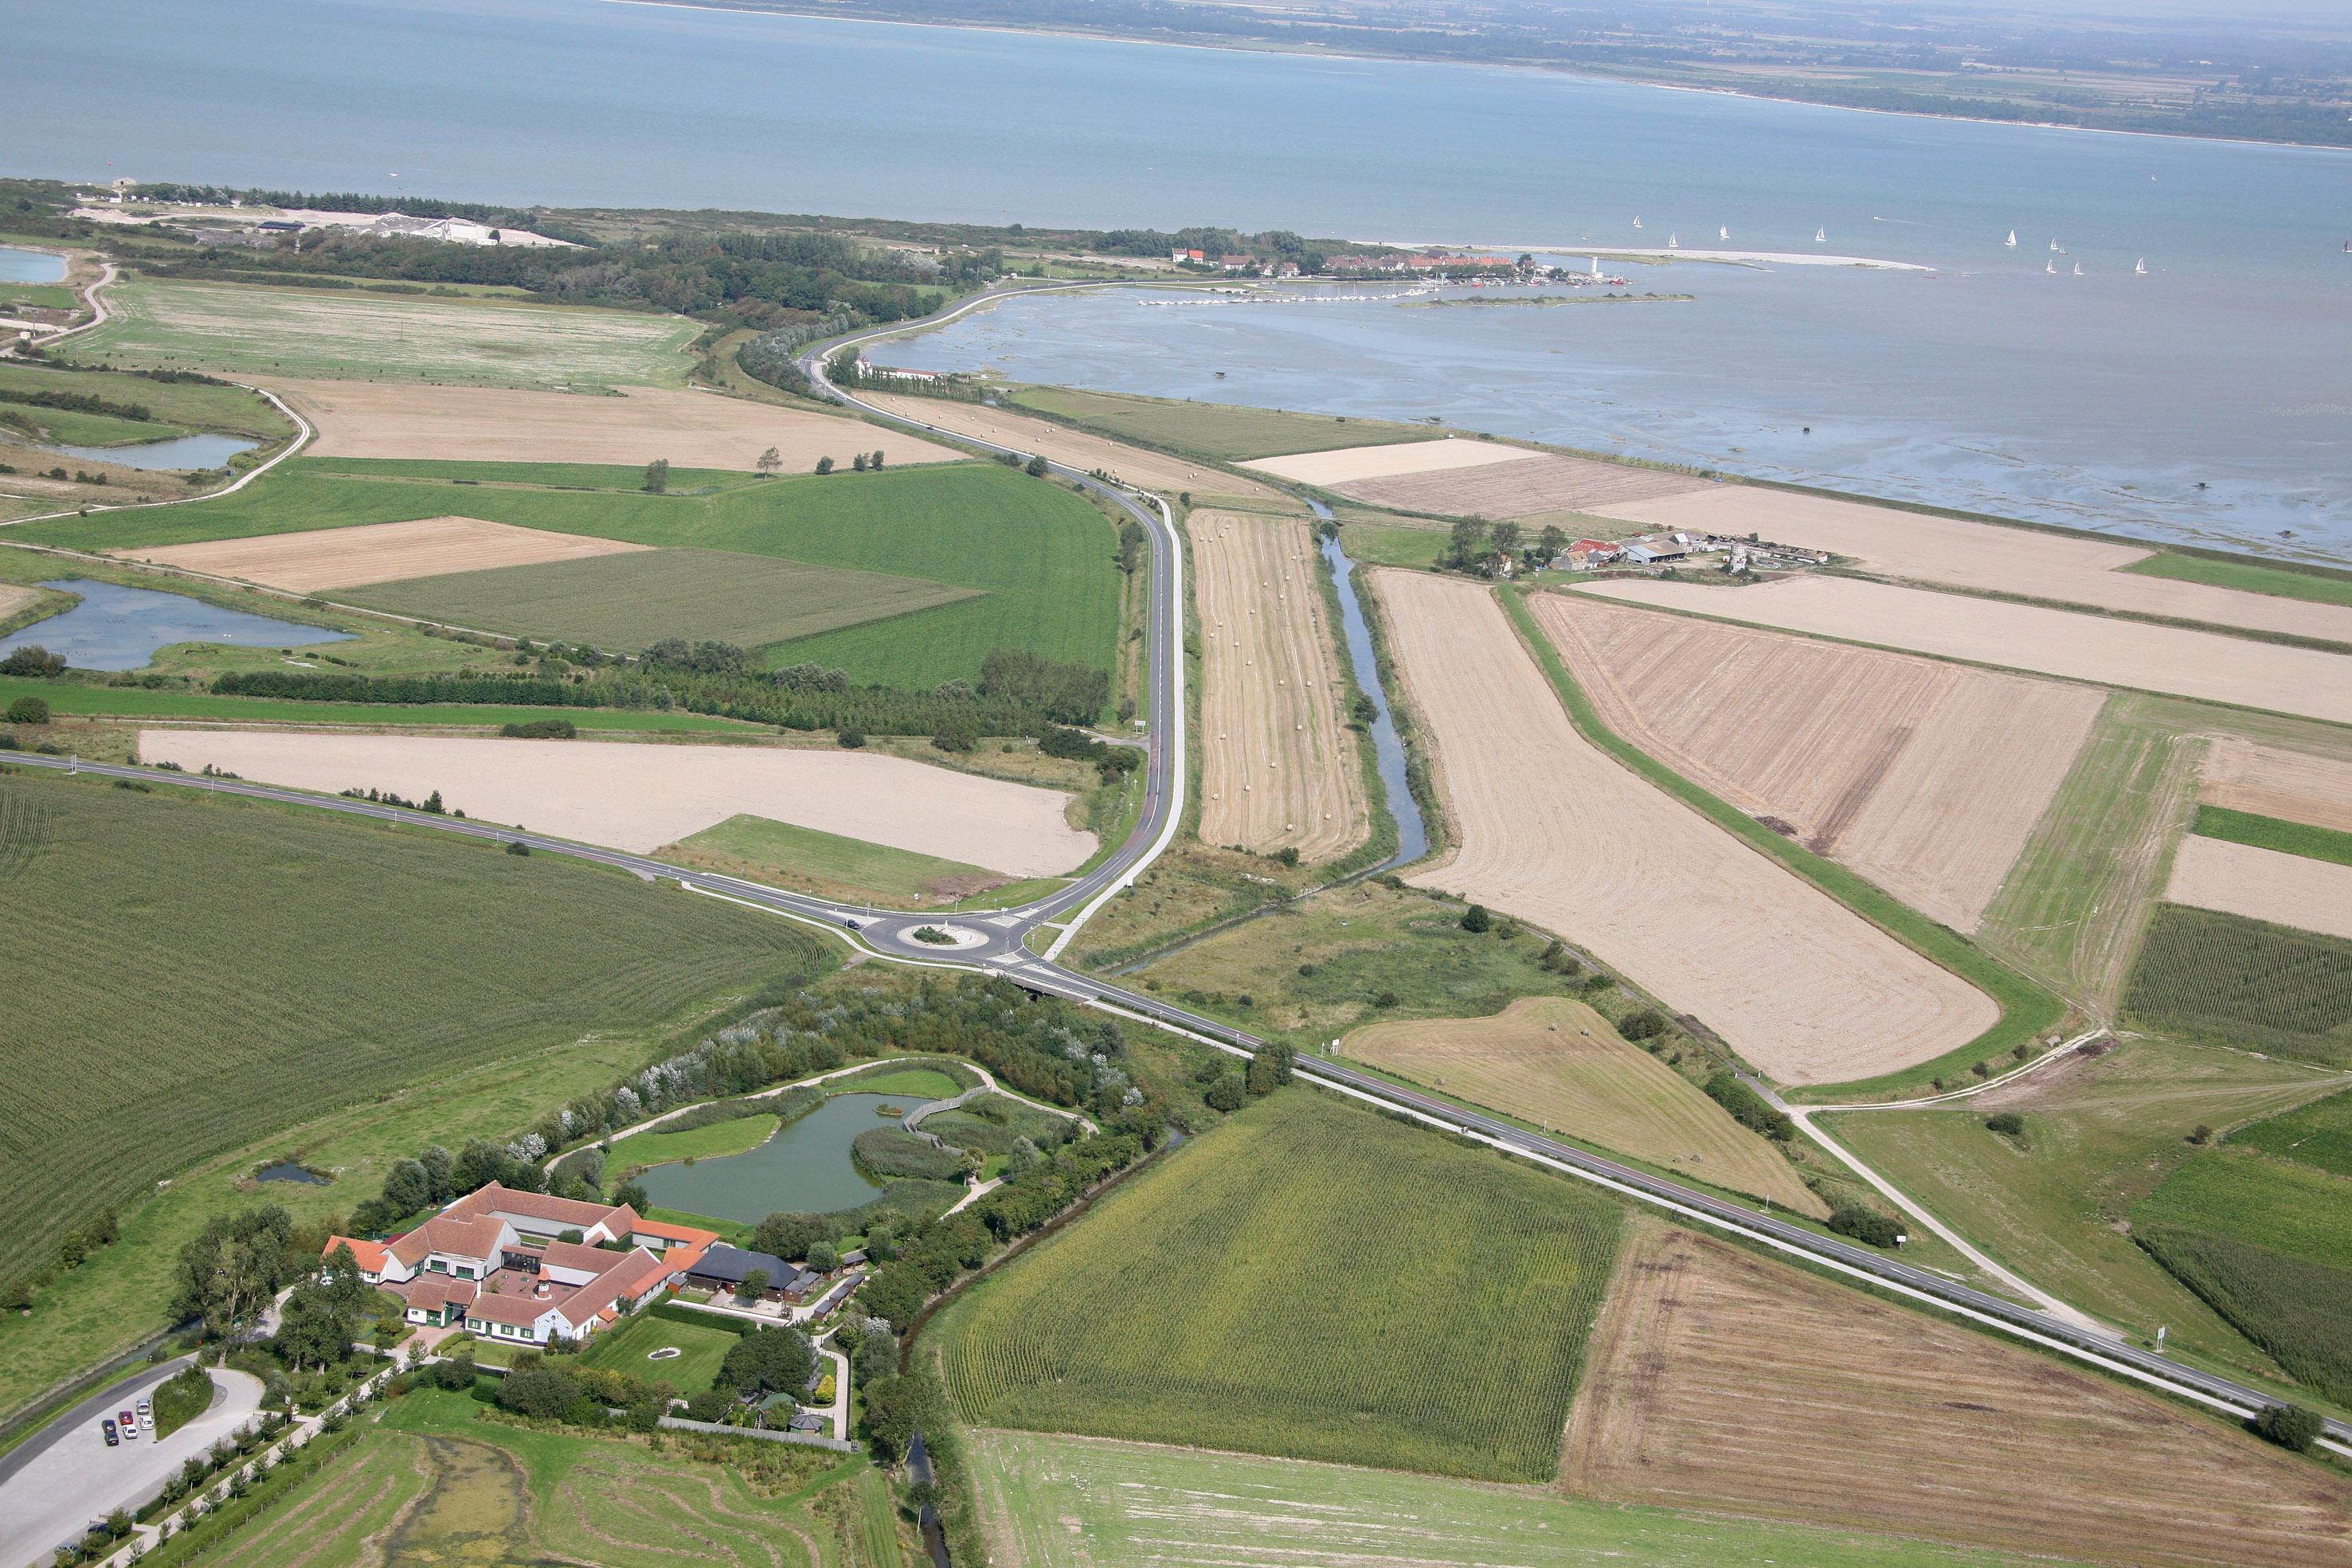 Baie de somme wetland link international - Baie de la somme ...